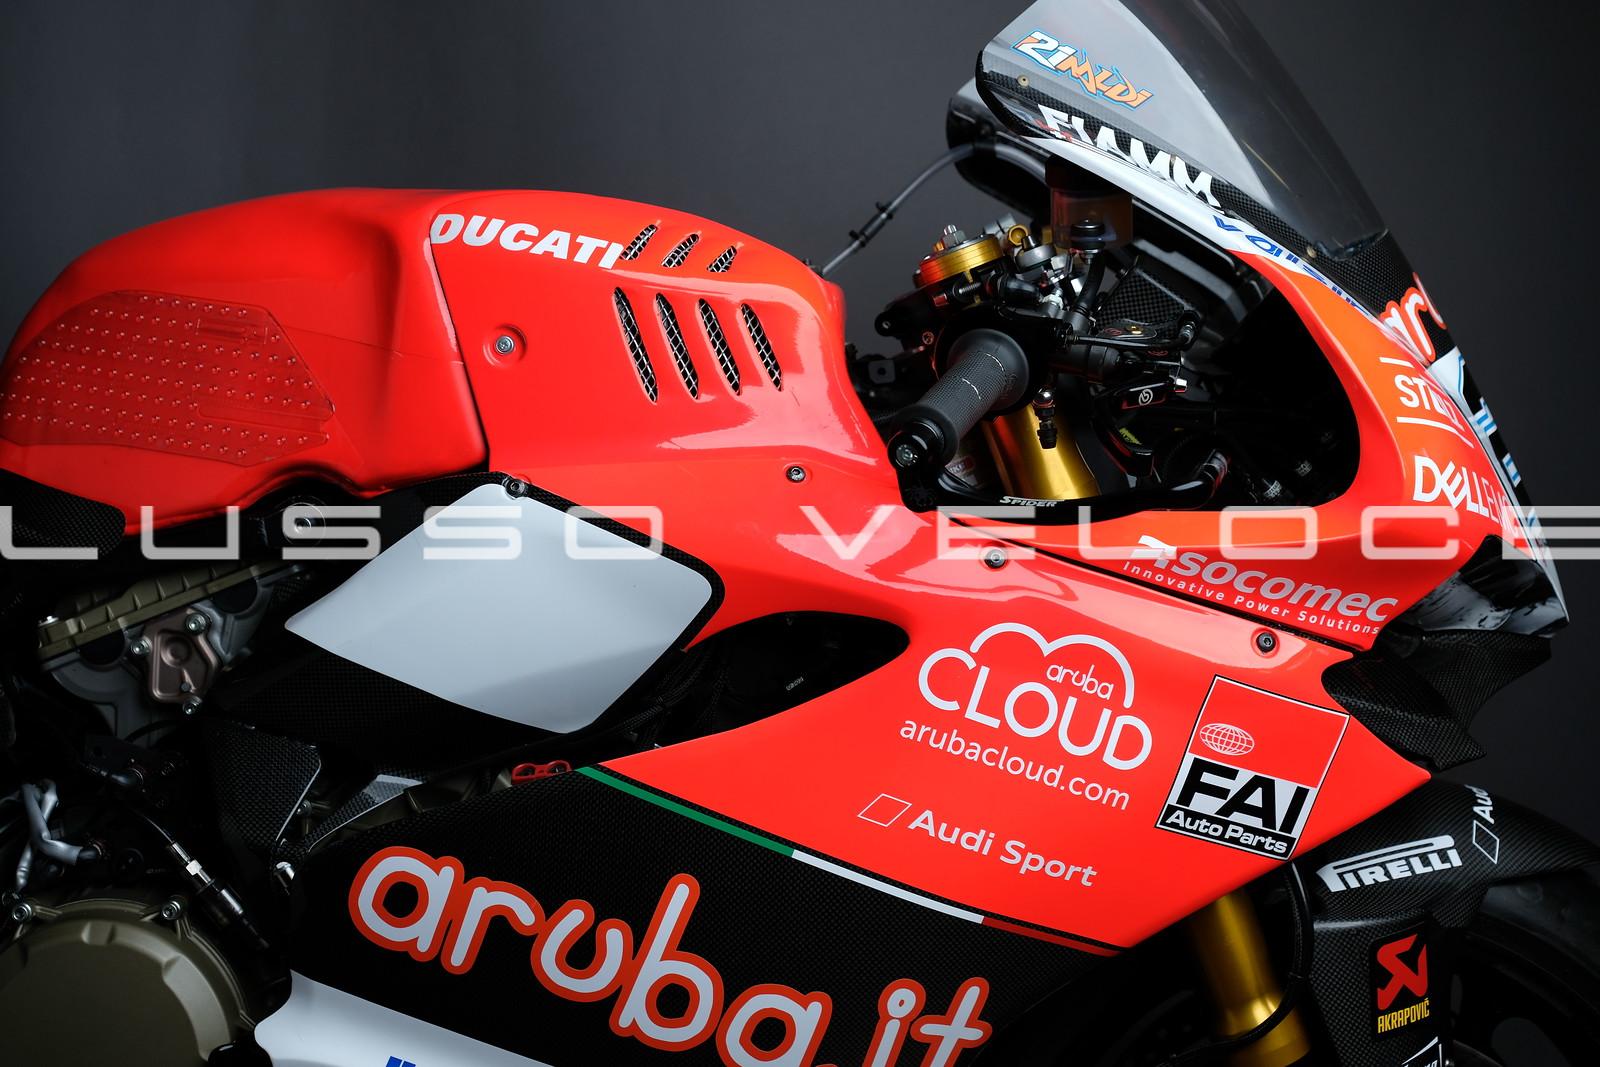 A chance to enjoy factory Rinaldi world superbike up close